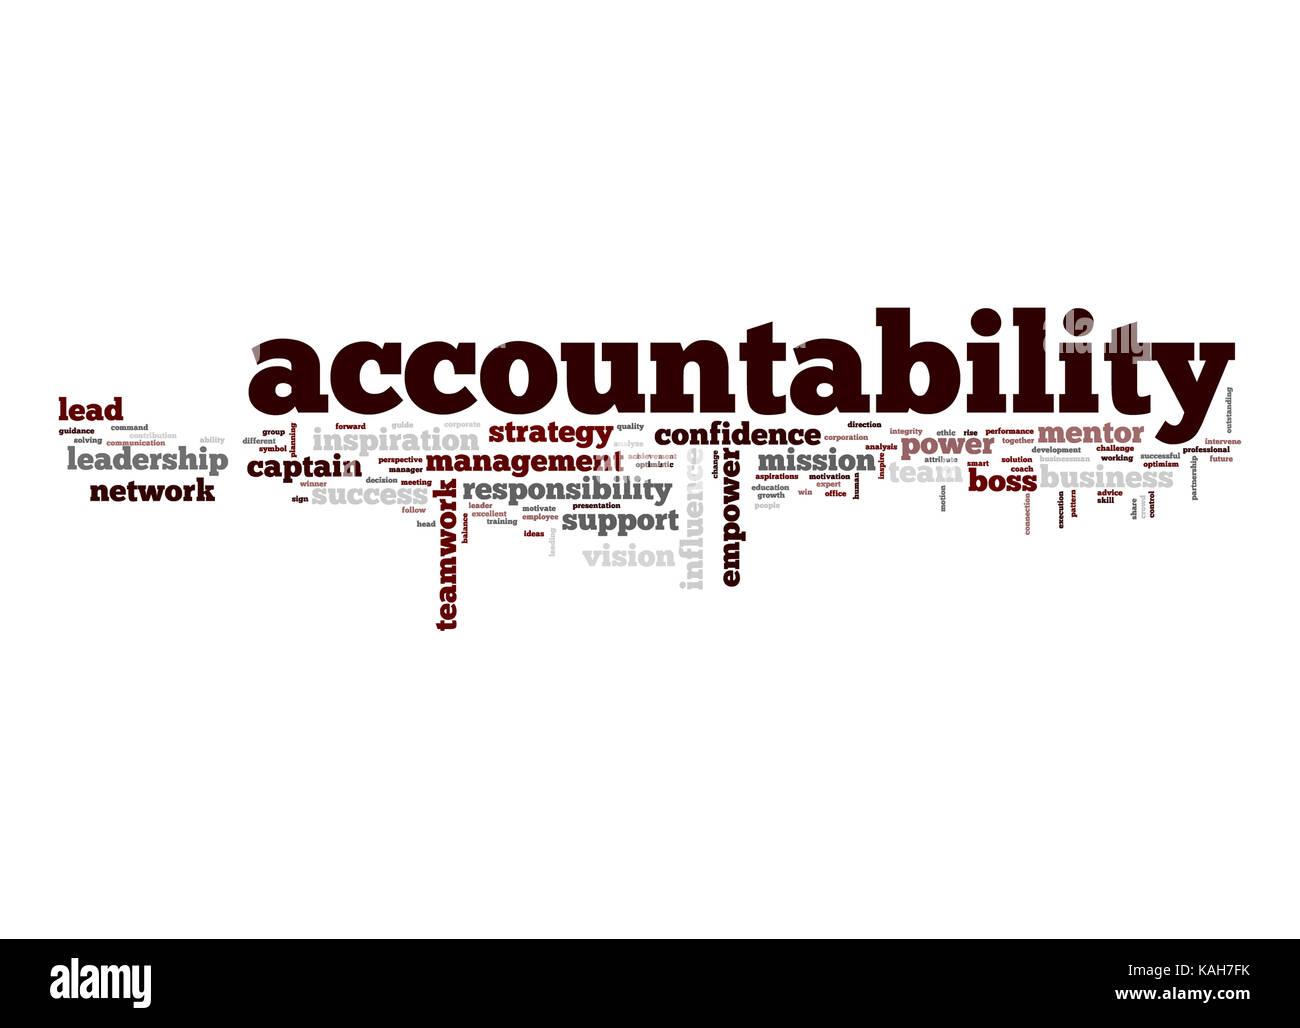 Accountability word cloud - Stock Image